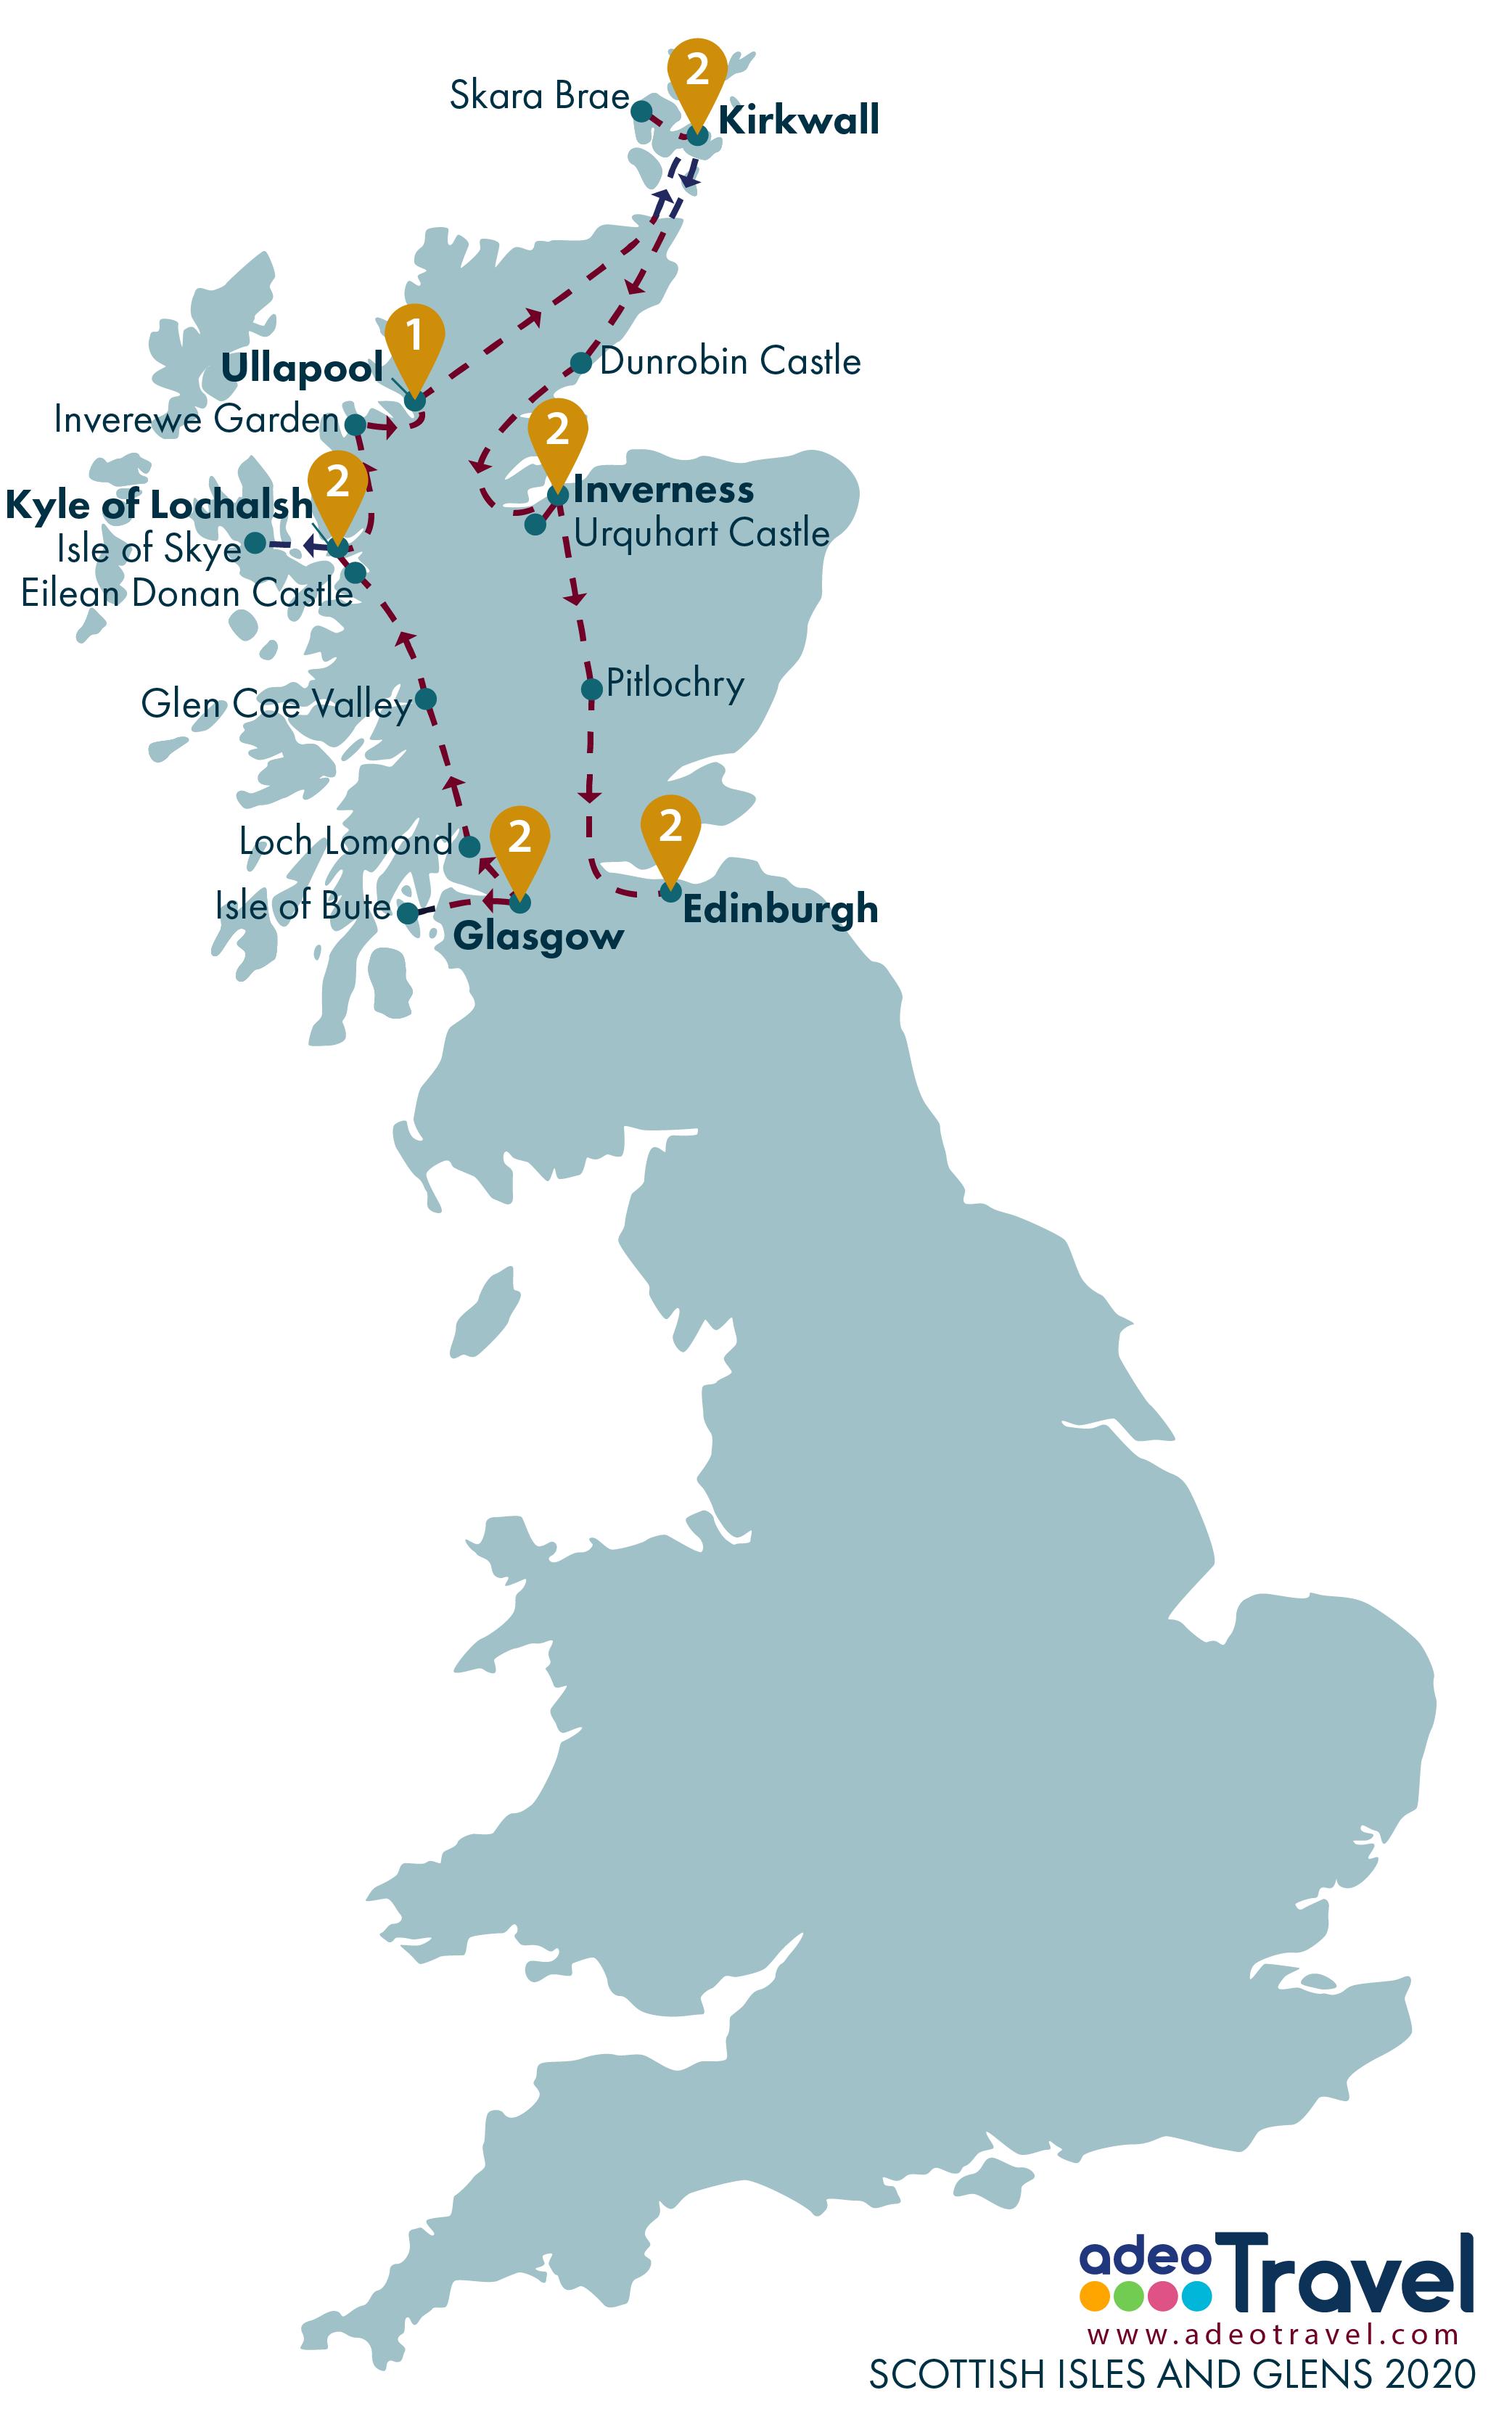 Map - Scottish Isles and Glens 2020